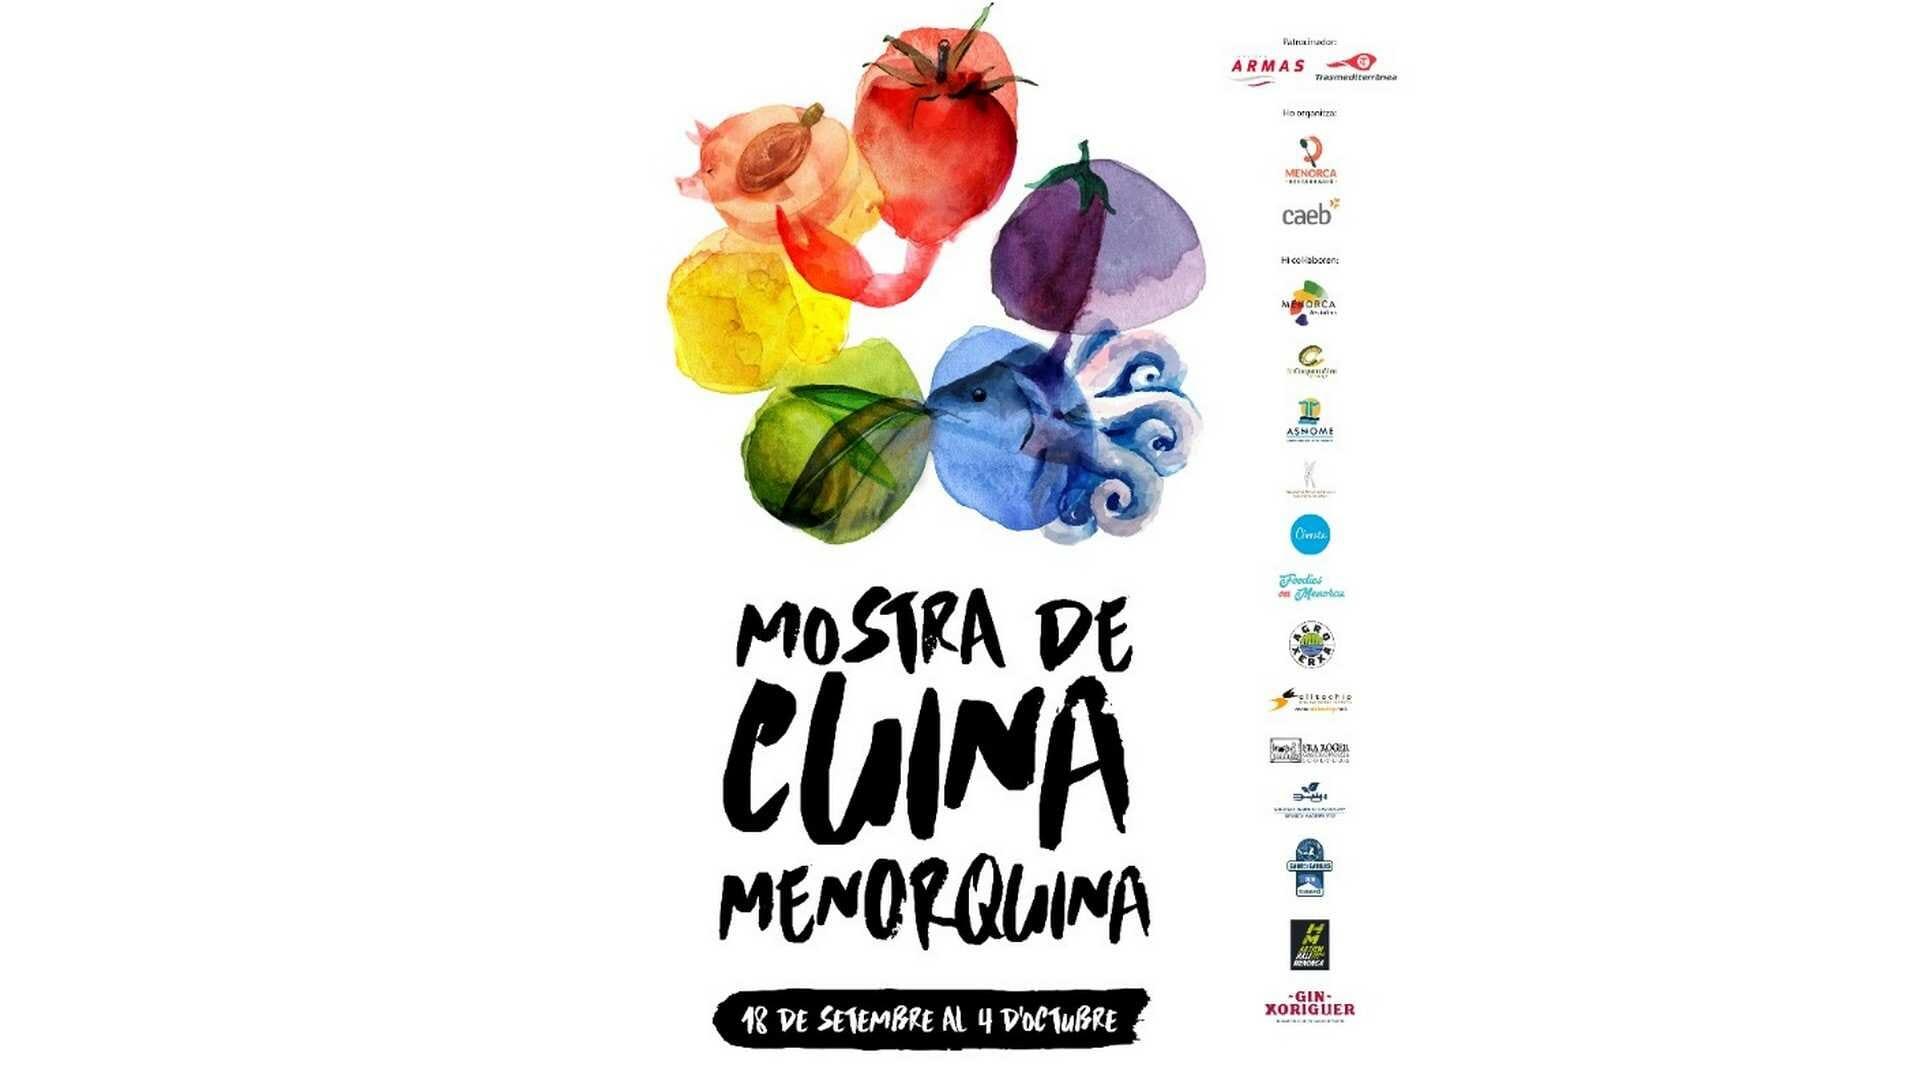 11ª edición de la 'Mostra de Cuina Menorquina'